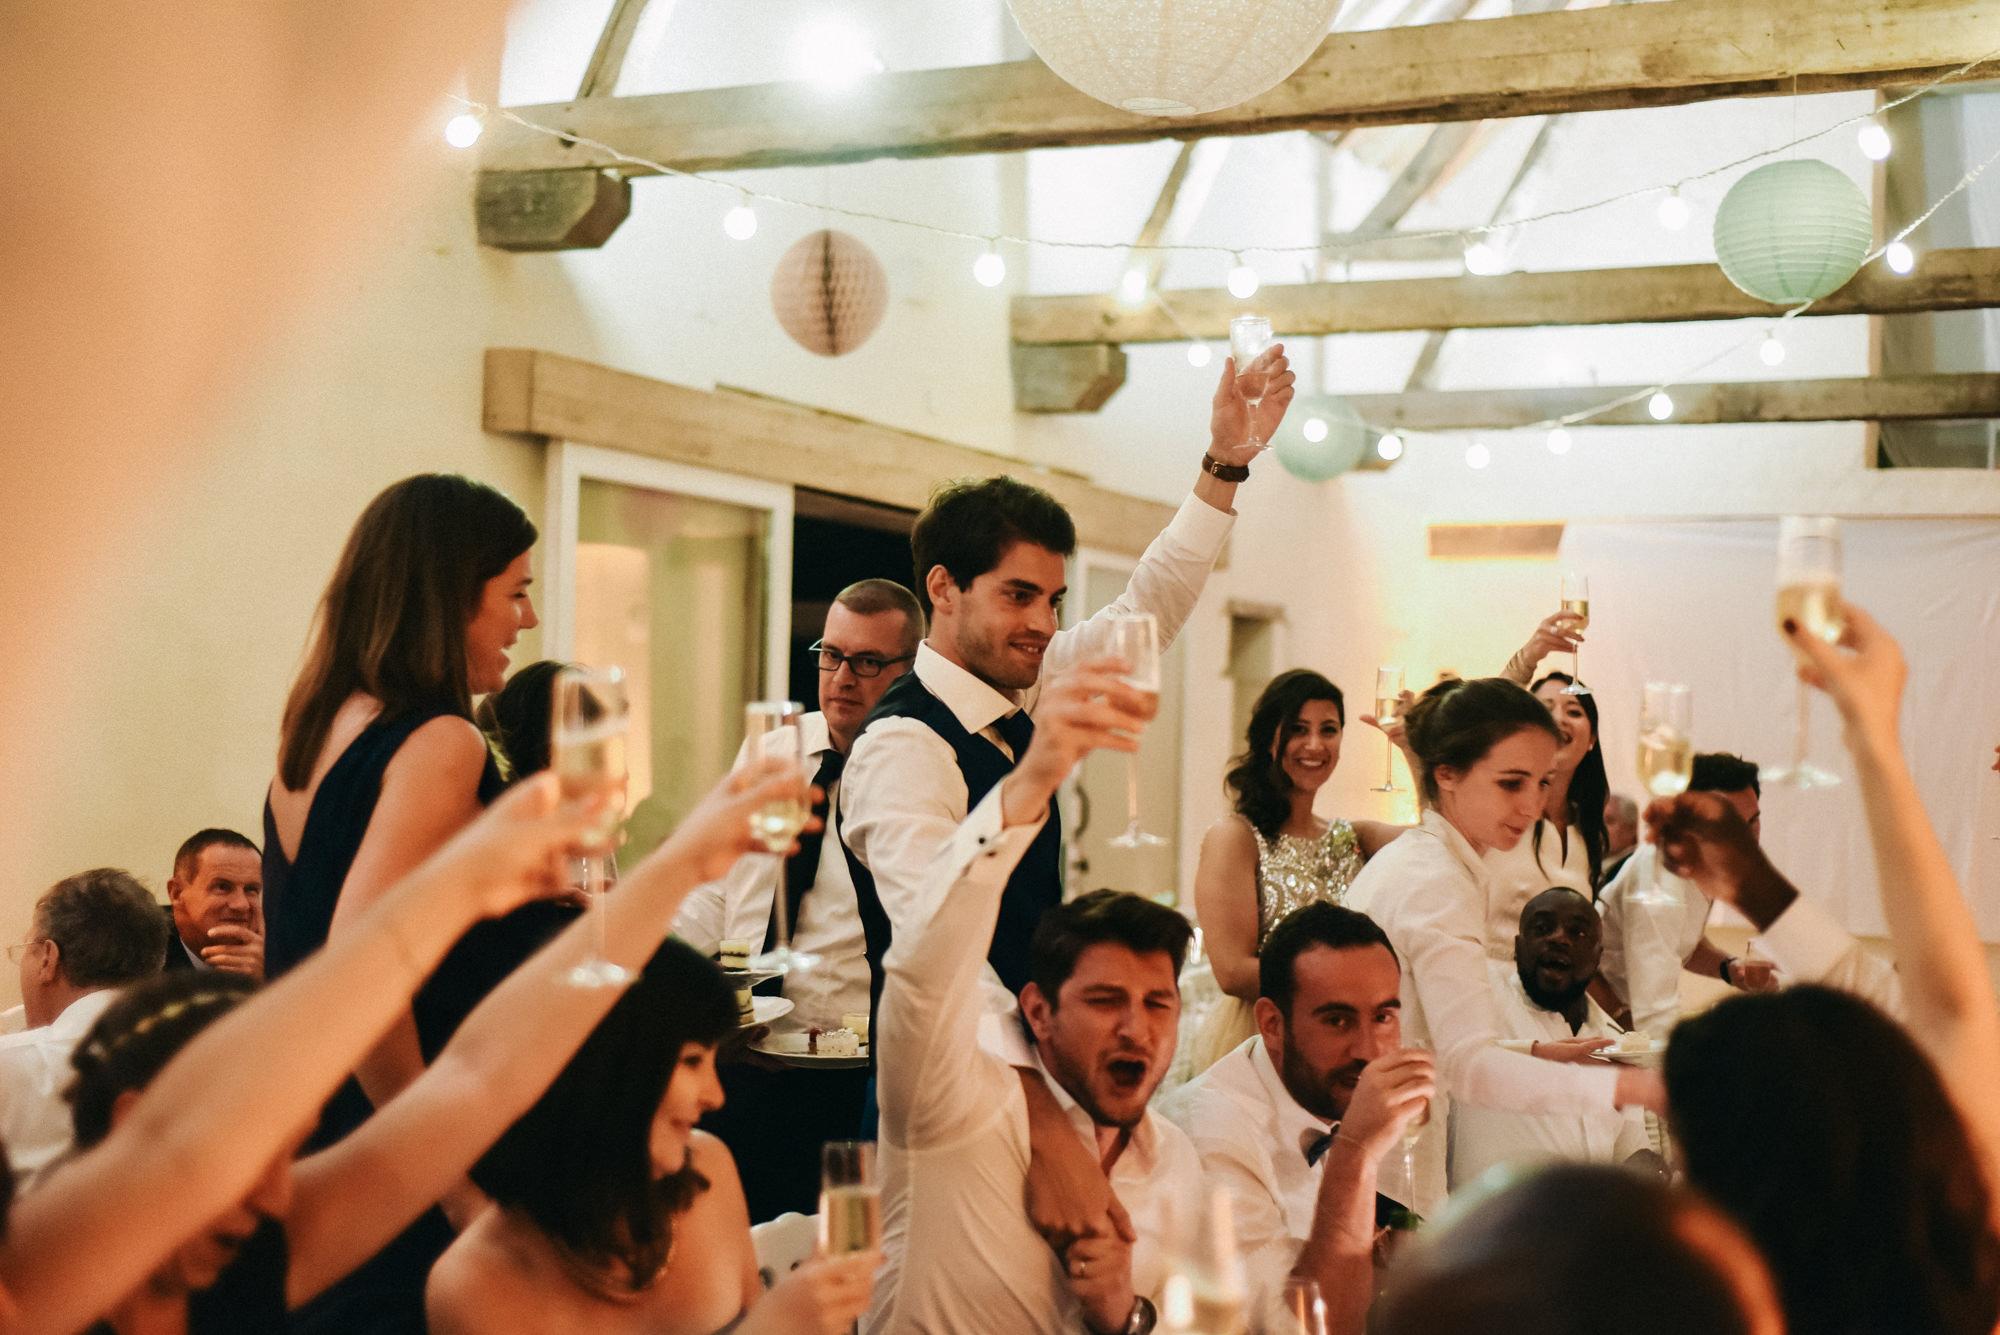 photographe-mariage-paris-nantes-provence-angers-64